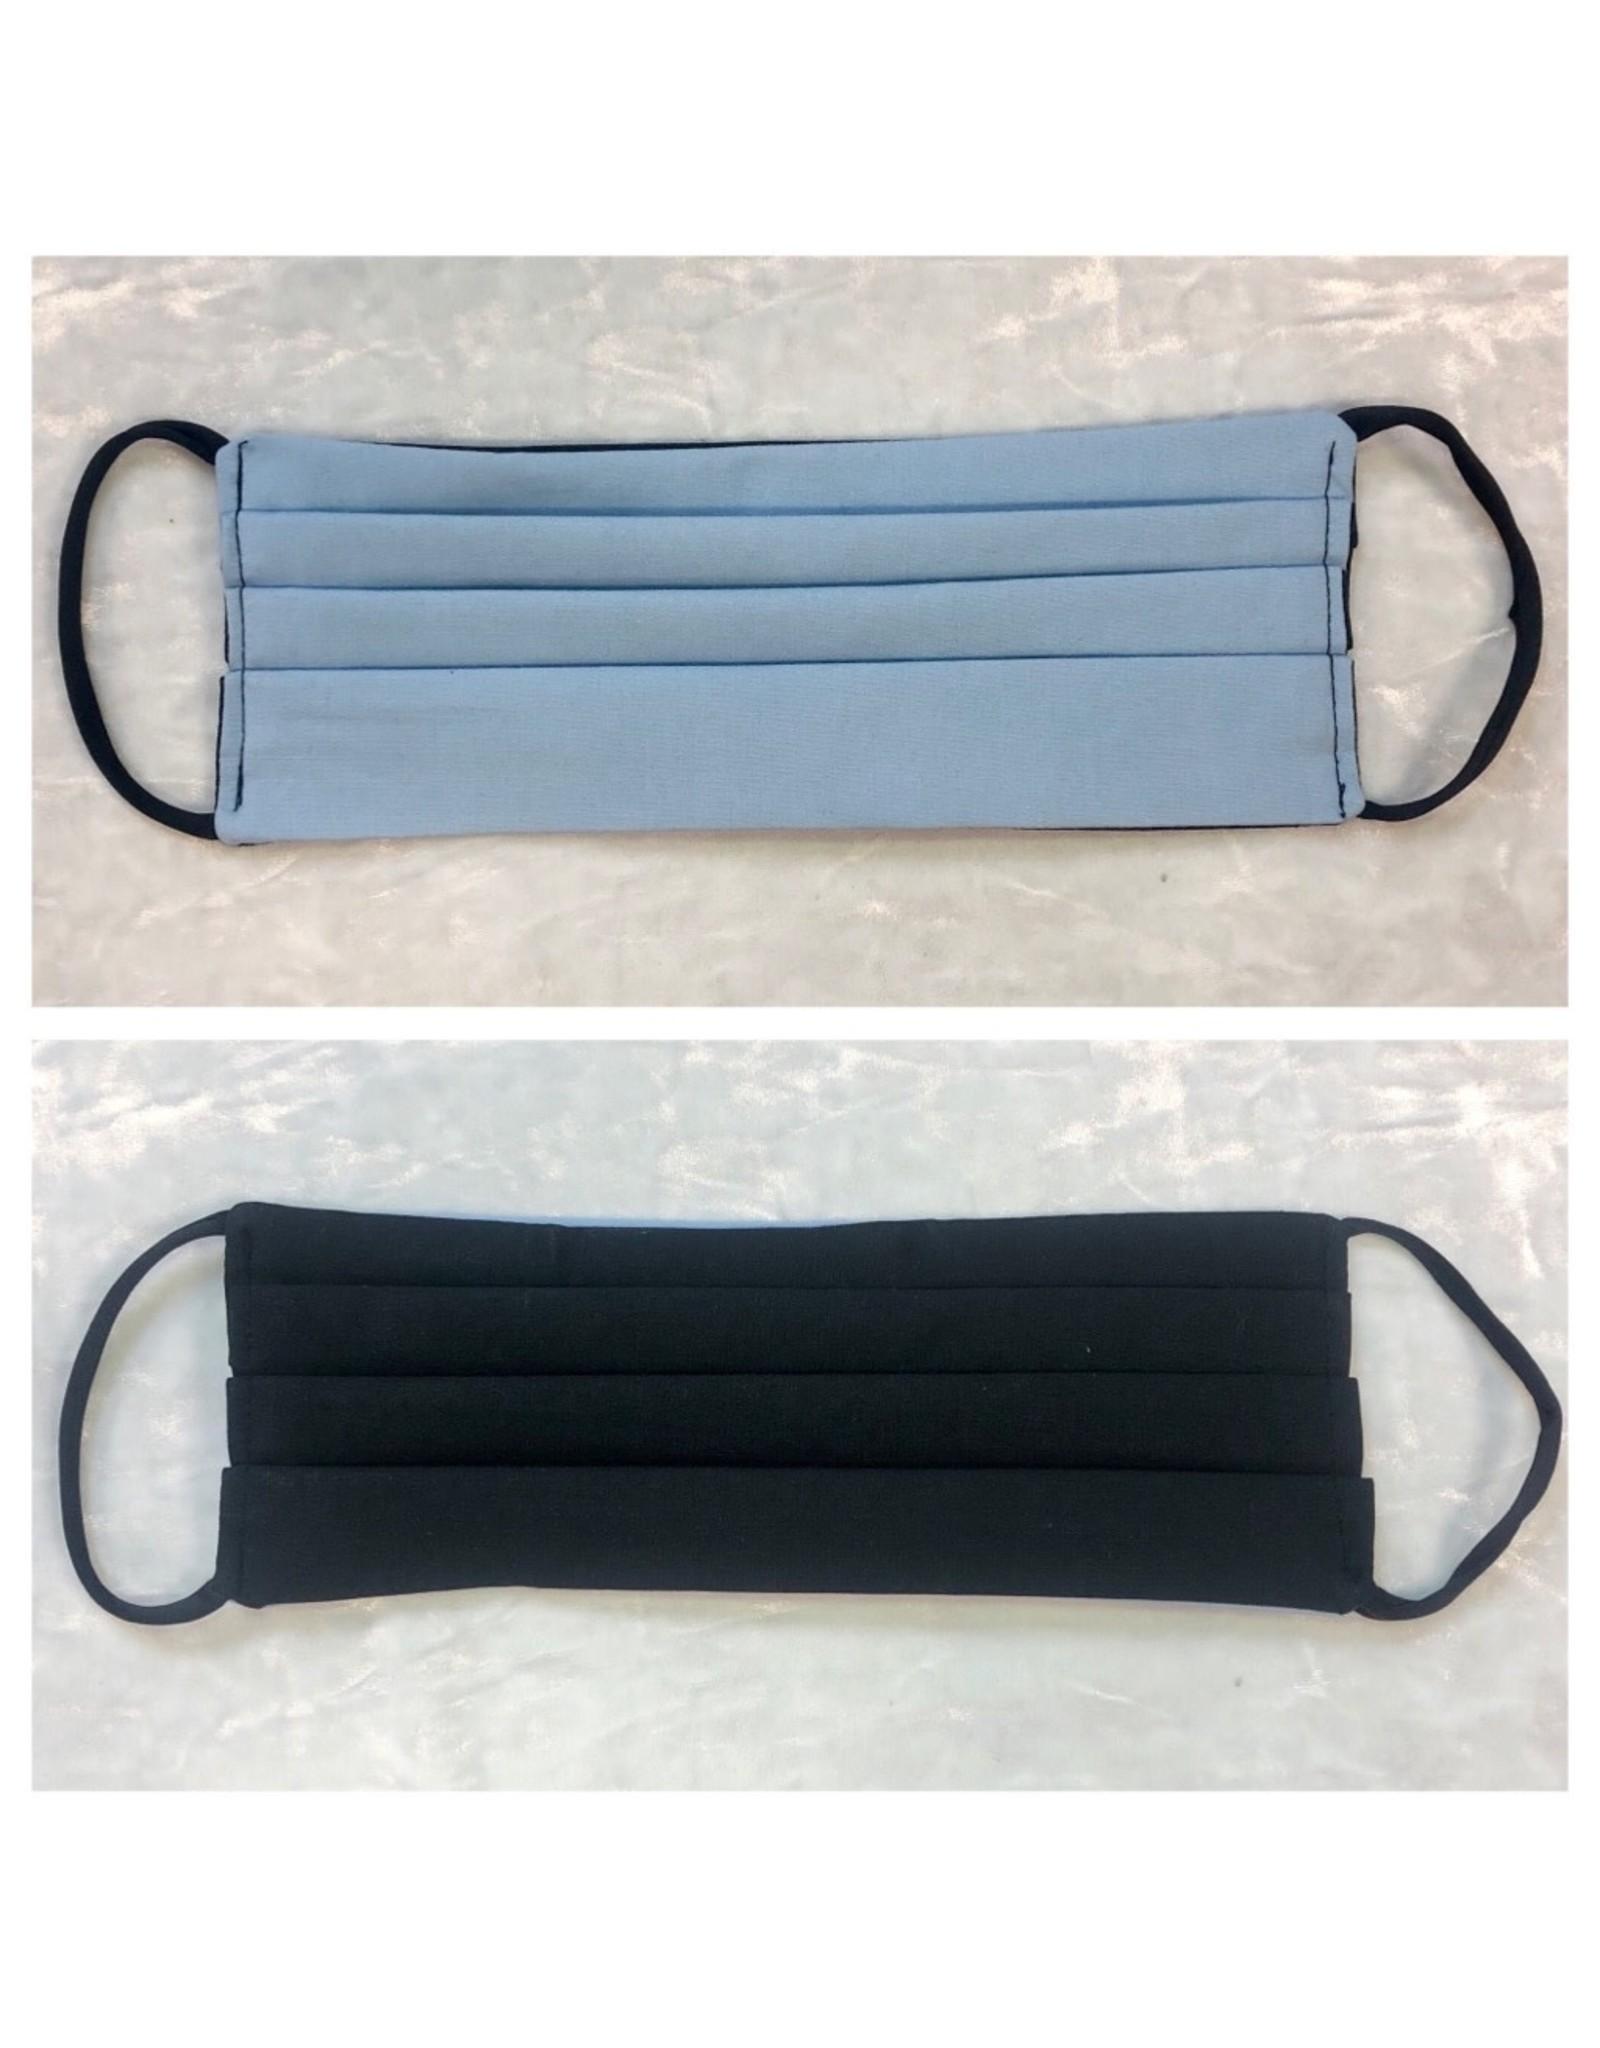 Karries Kostumes Lrg Fabric Face Mask -Light Blue+Black